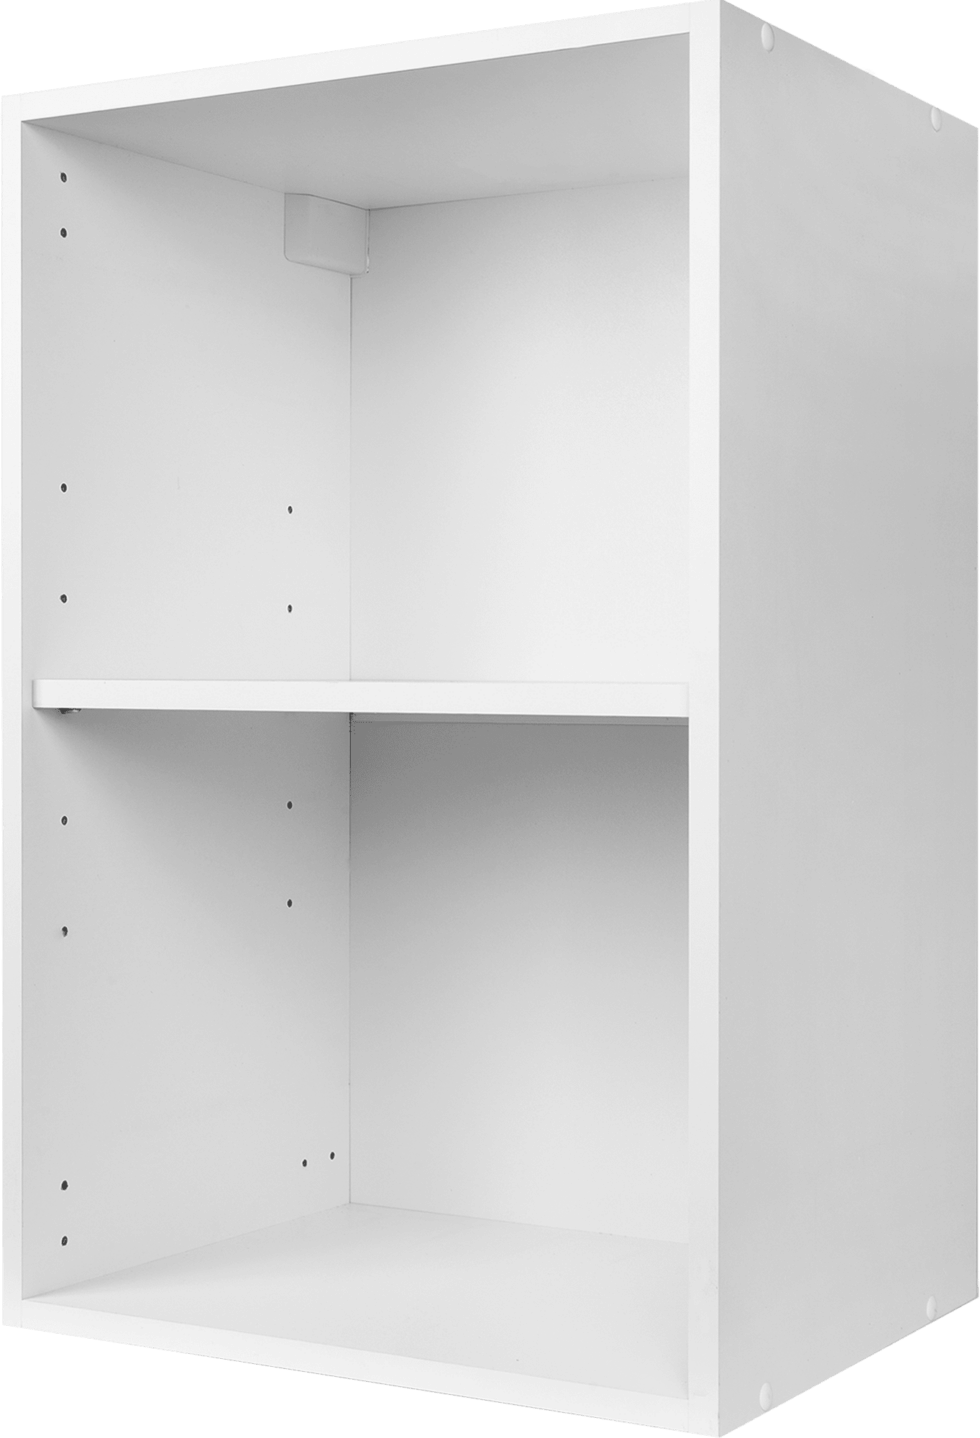 Каркас навесной 45х35х70 см, ЛДСП, цвет белый